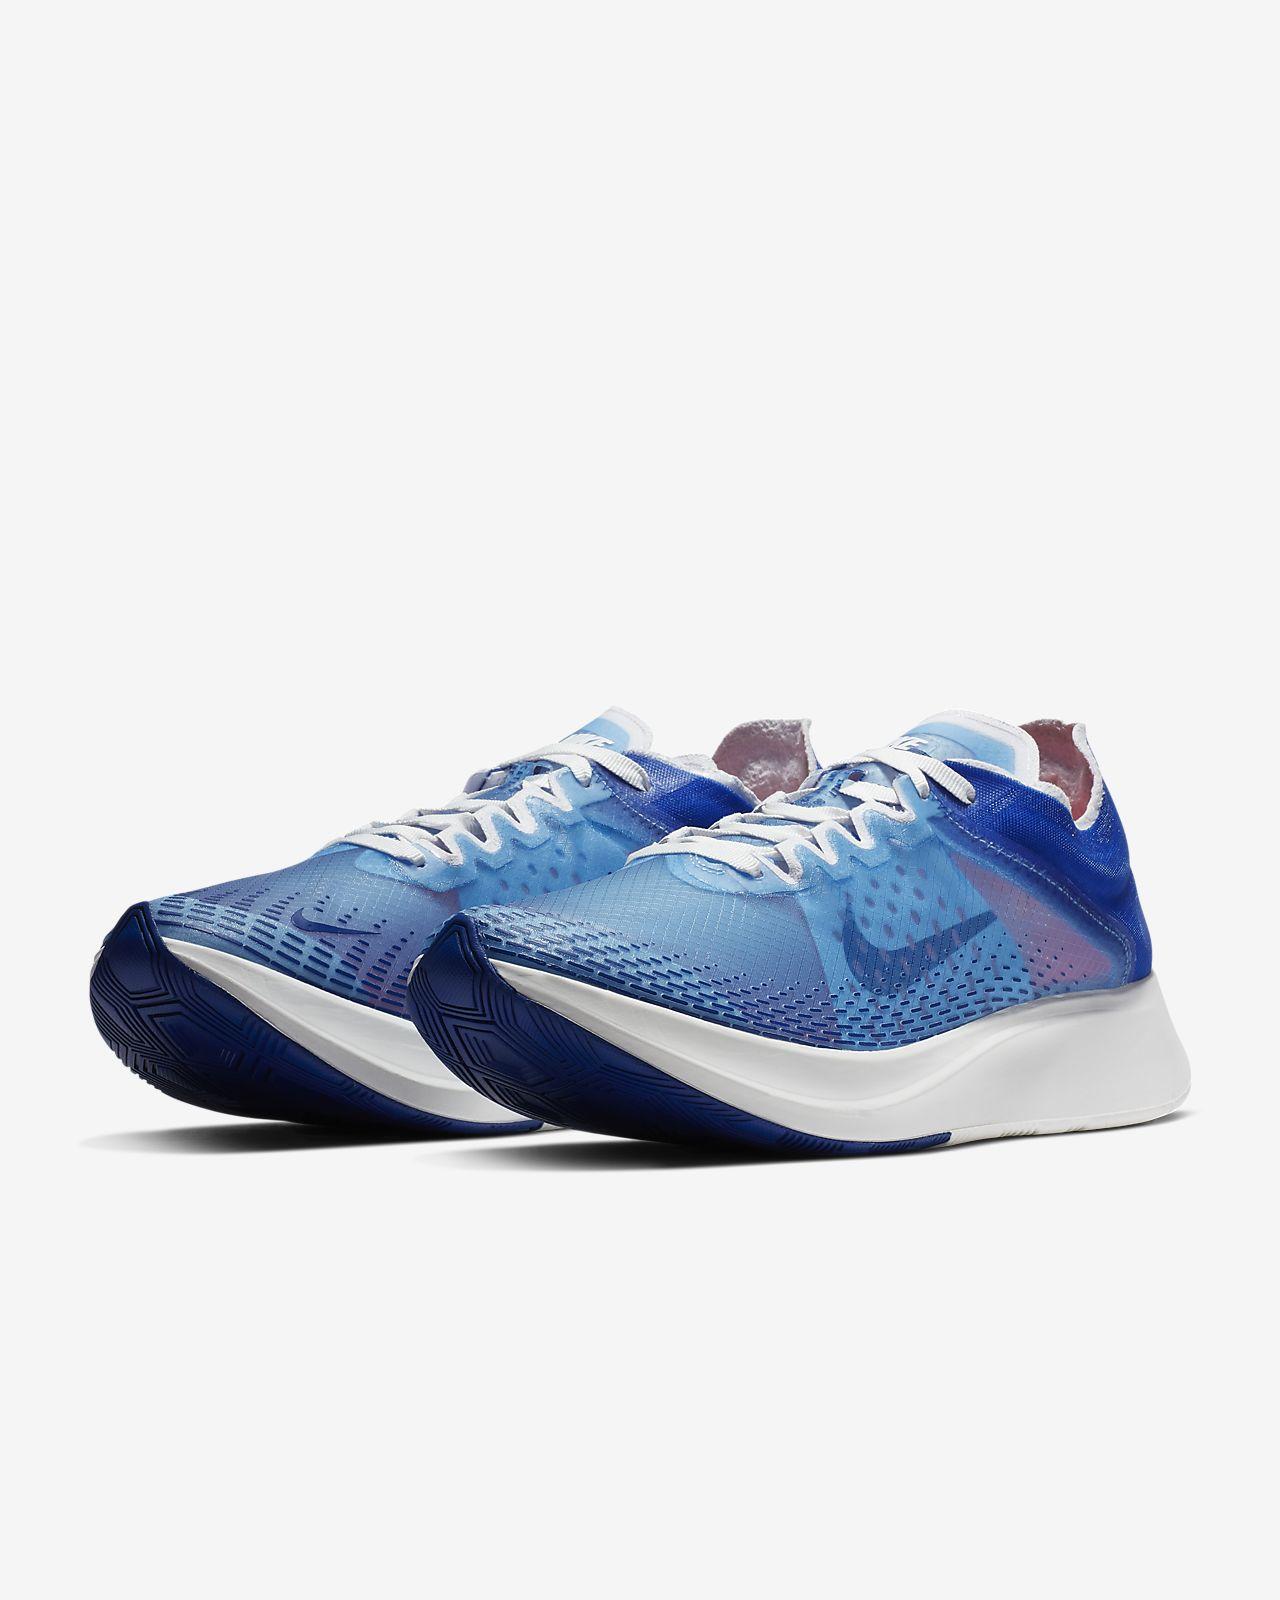 56e7c9282c9 Nike Zoom Fly SP Fast Women s Running Shoe. Nike.com AU